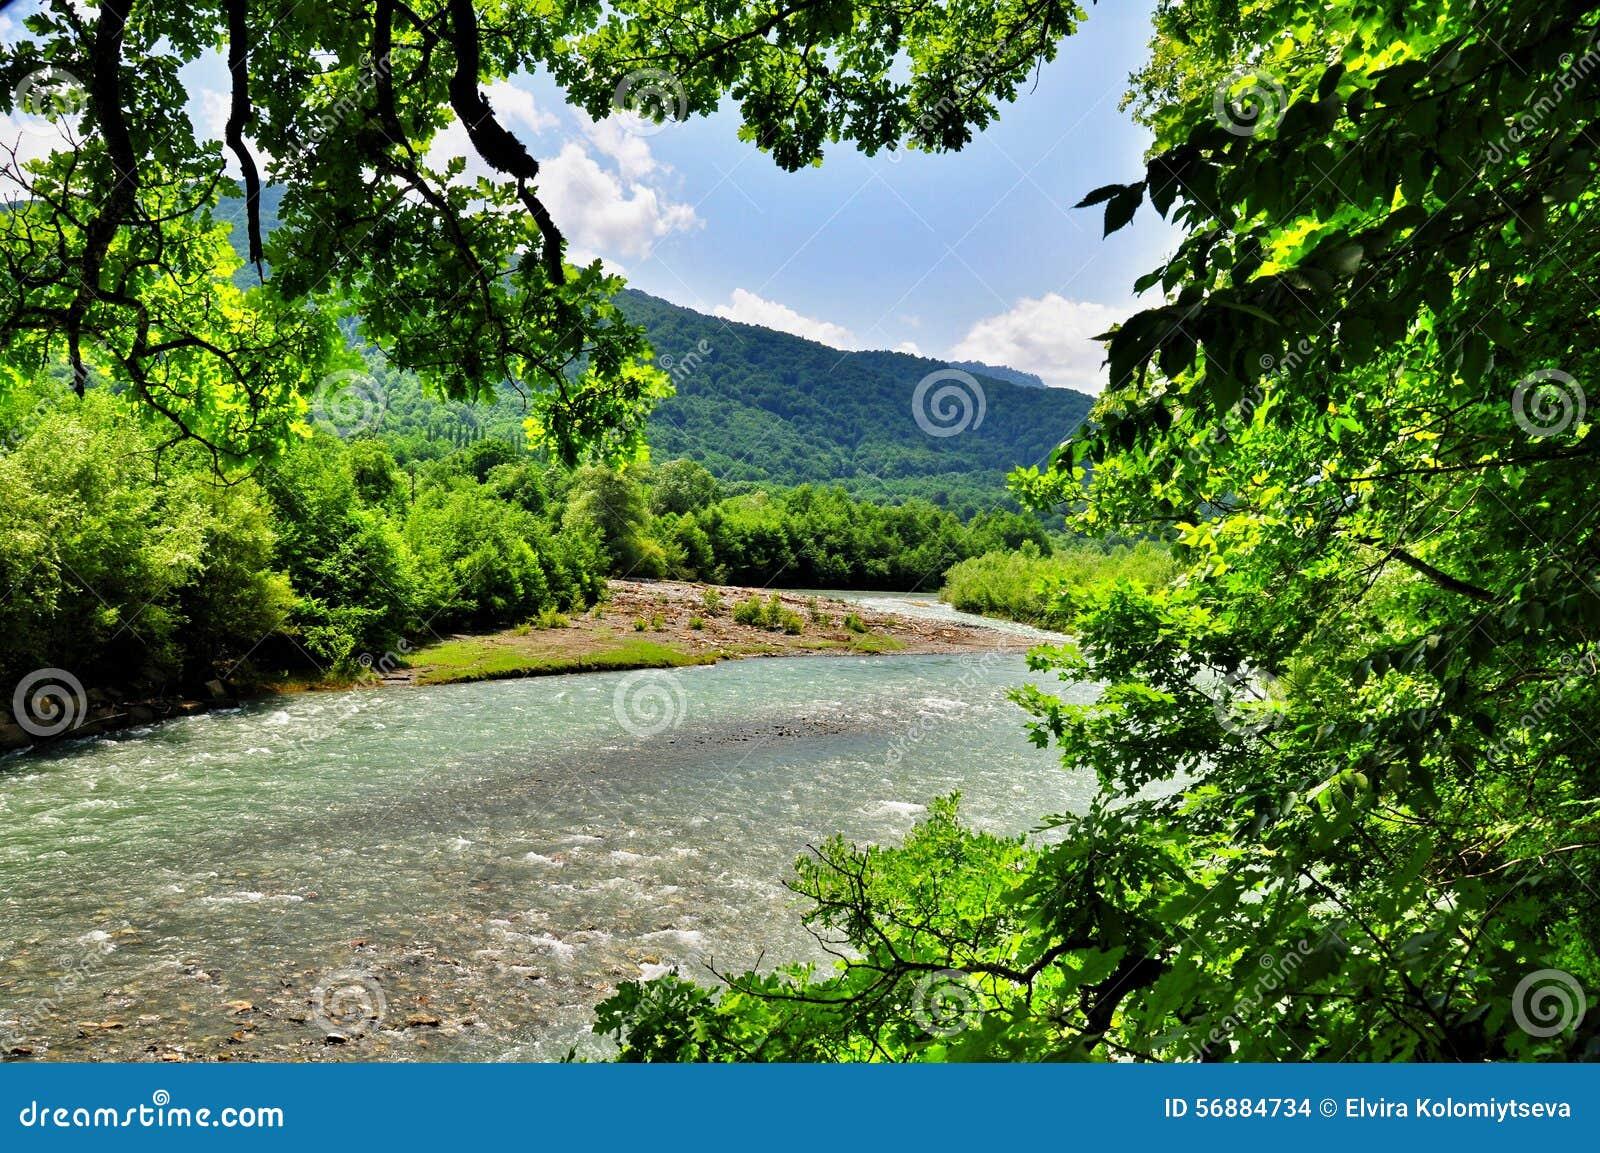 Landscape of fast river Malaya Laba